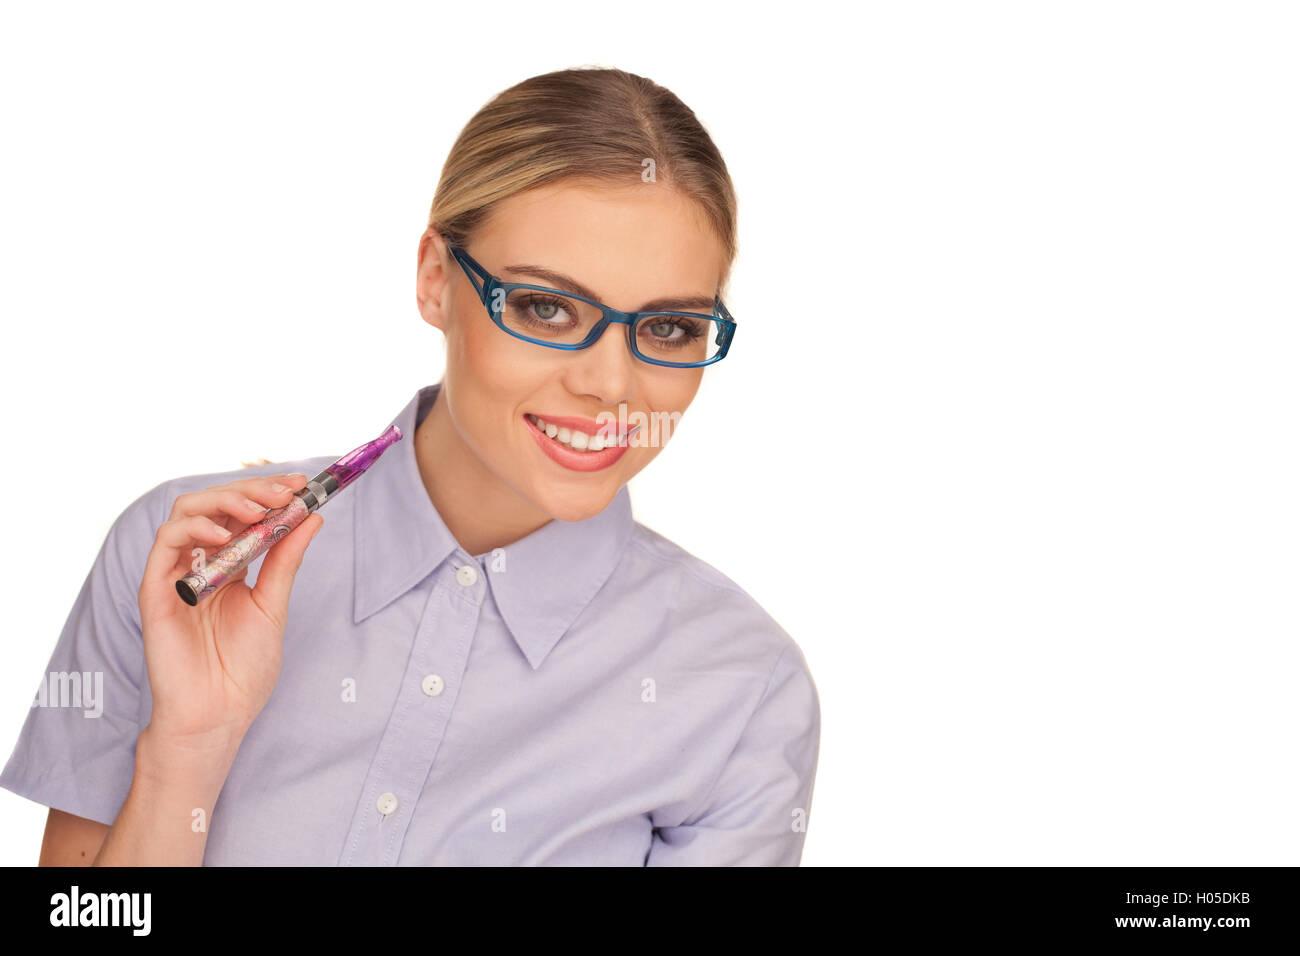 Young Woman Smokin Electic Cigarette Stock Photo